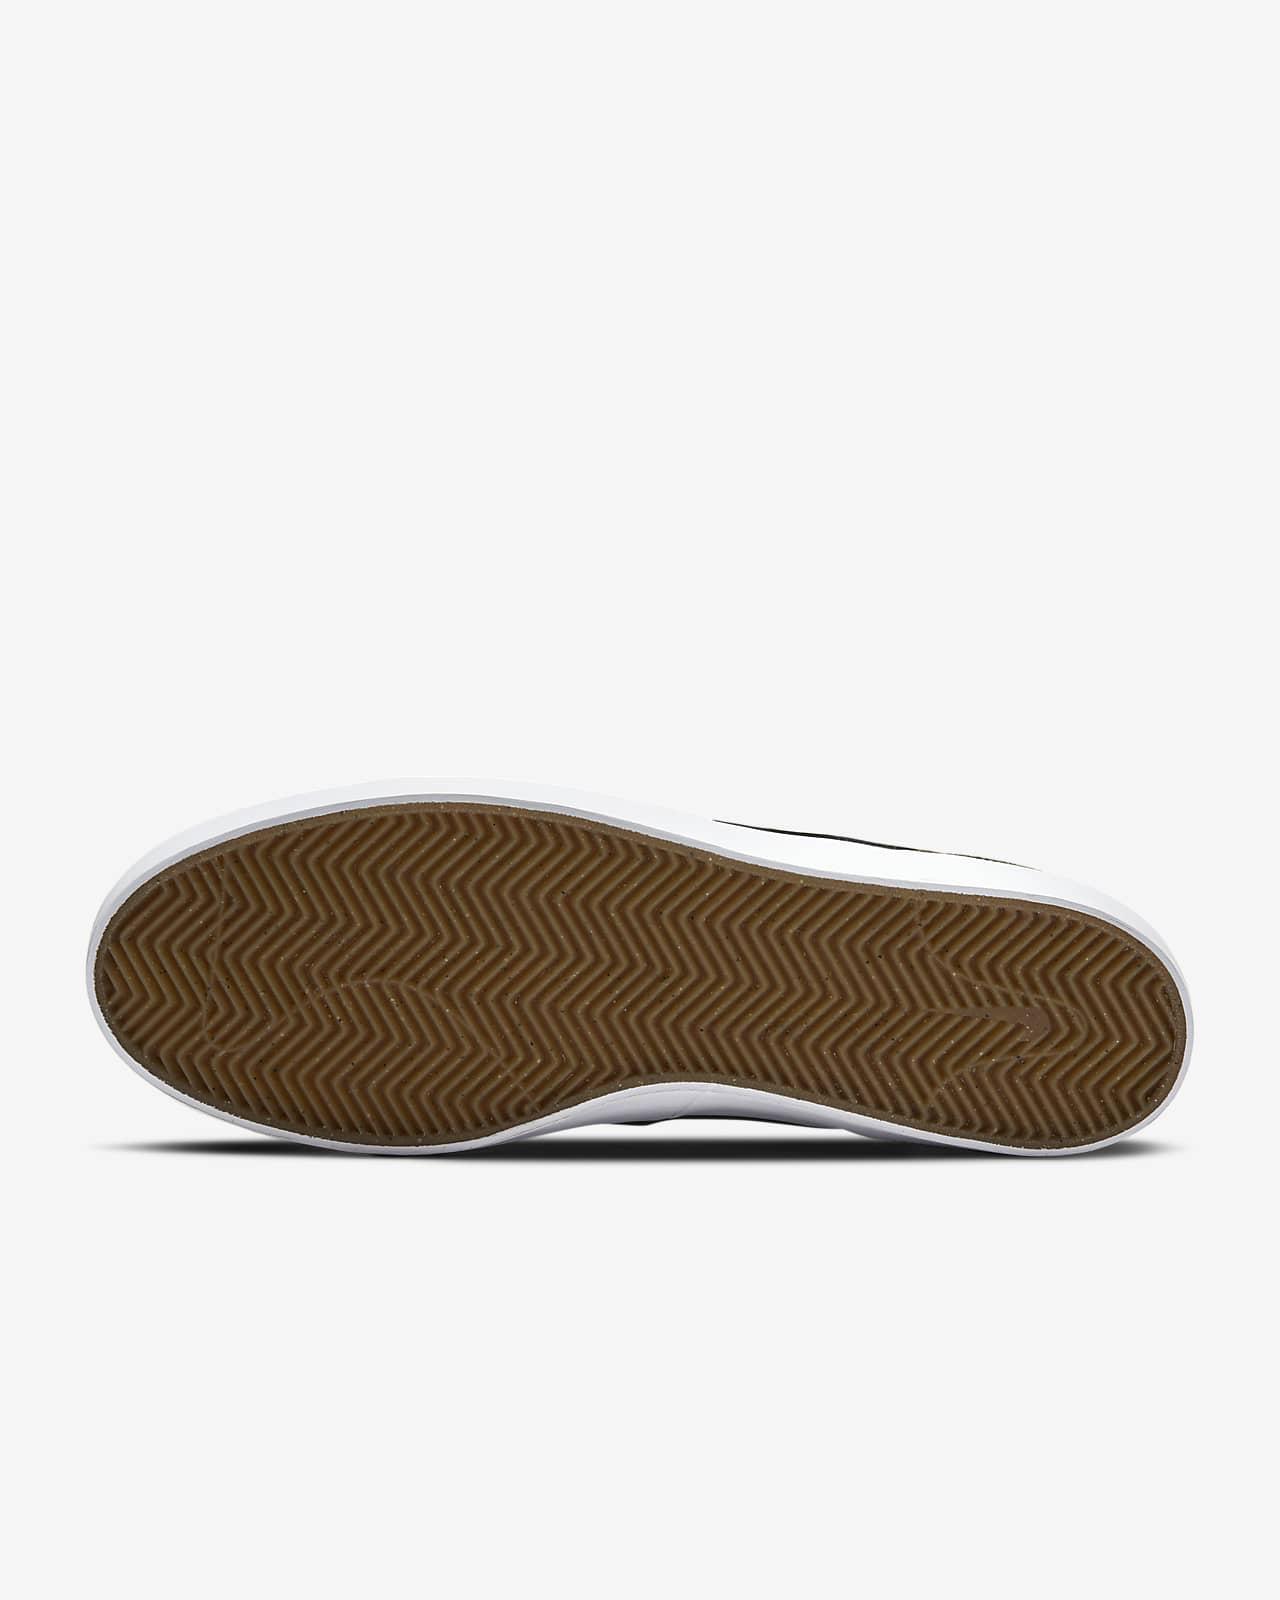 Nike SB Heritage Vulc Premium Zapatillas de skateboard